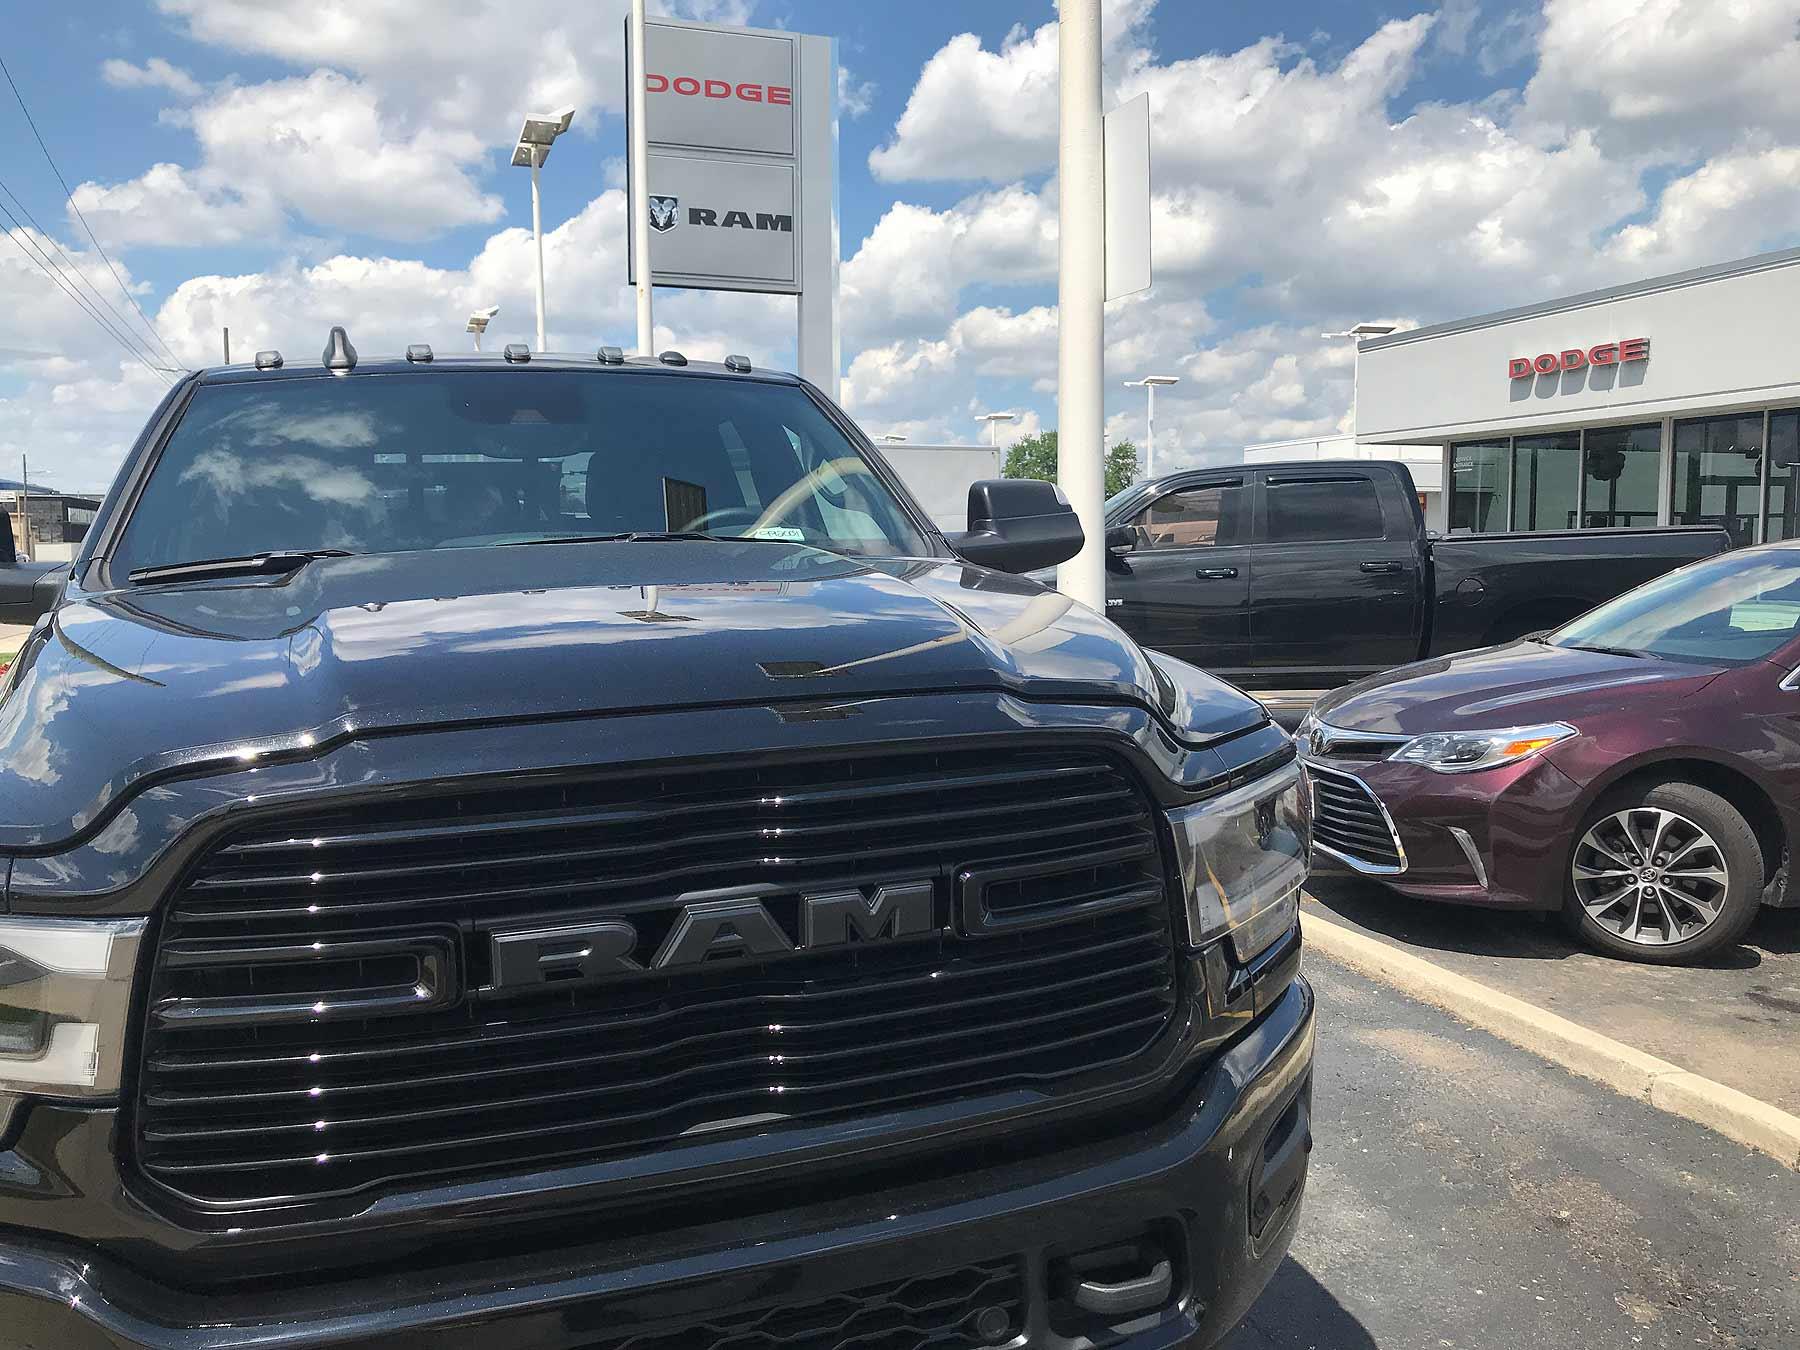 U S  June auto sales: FCA, Hyundai volume edges up behind